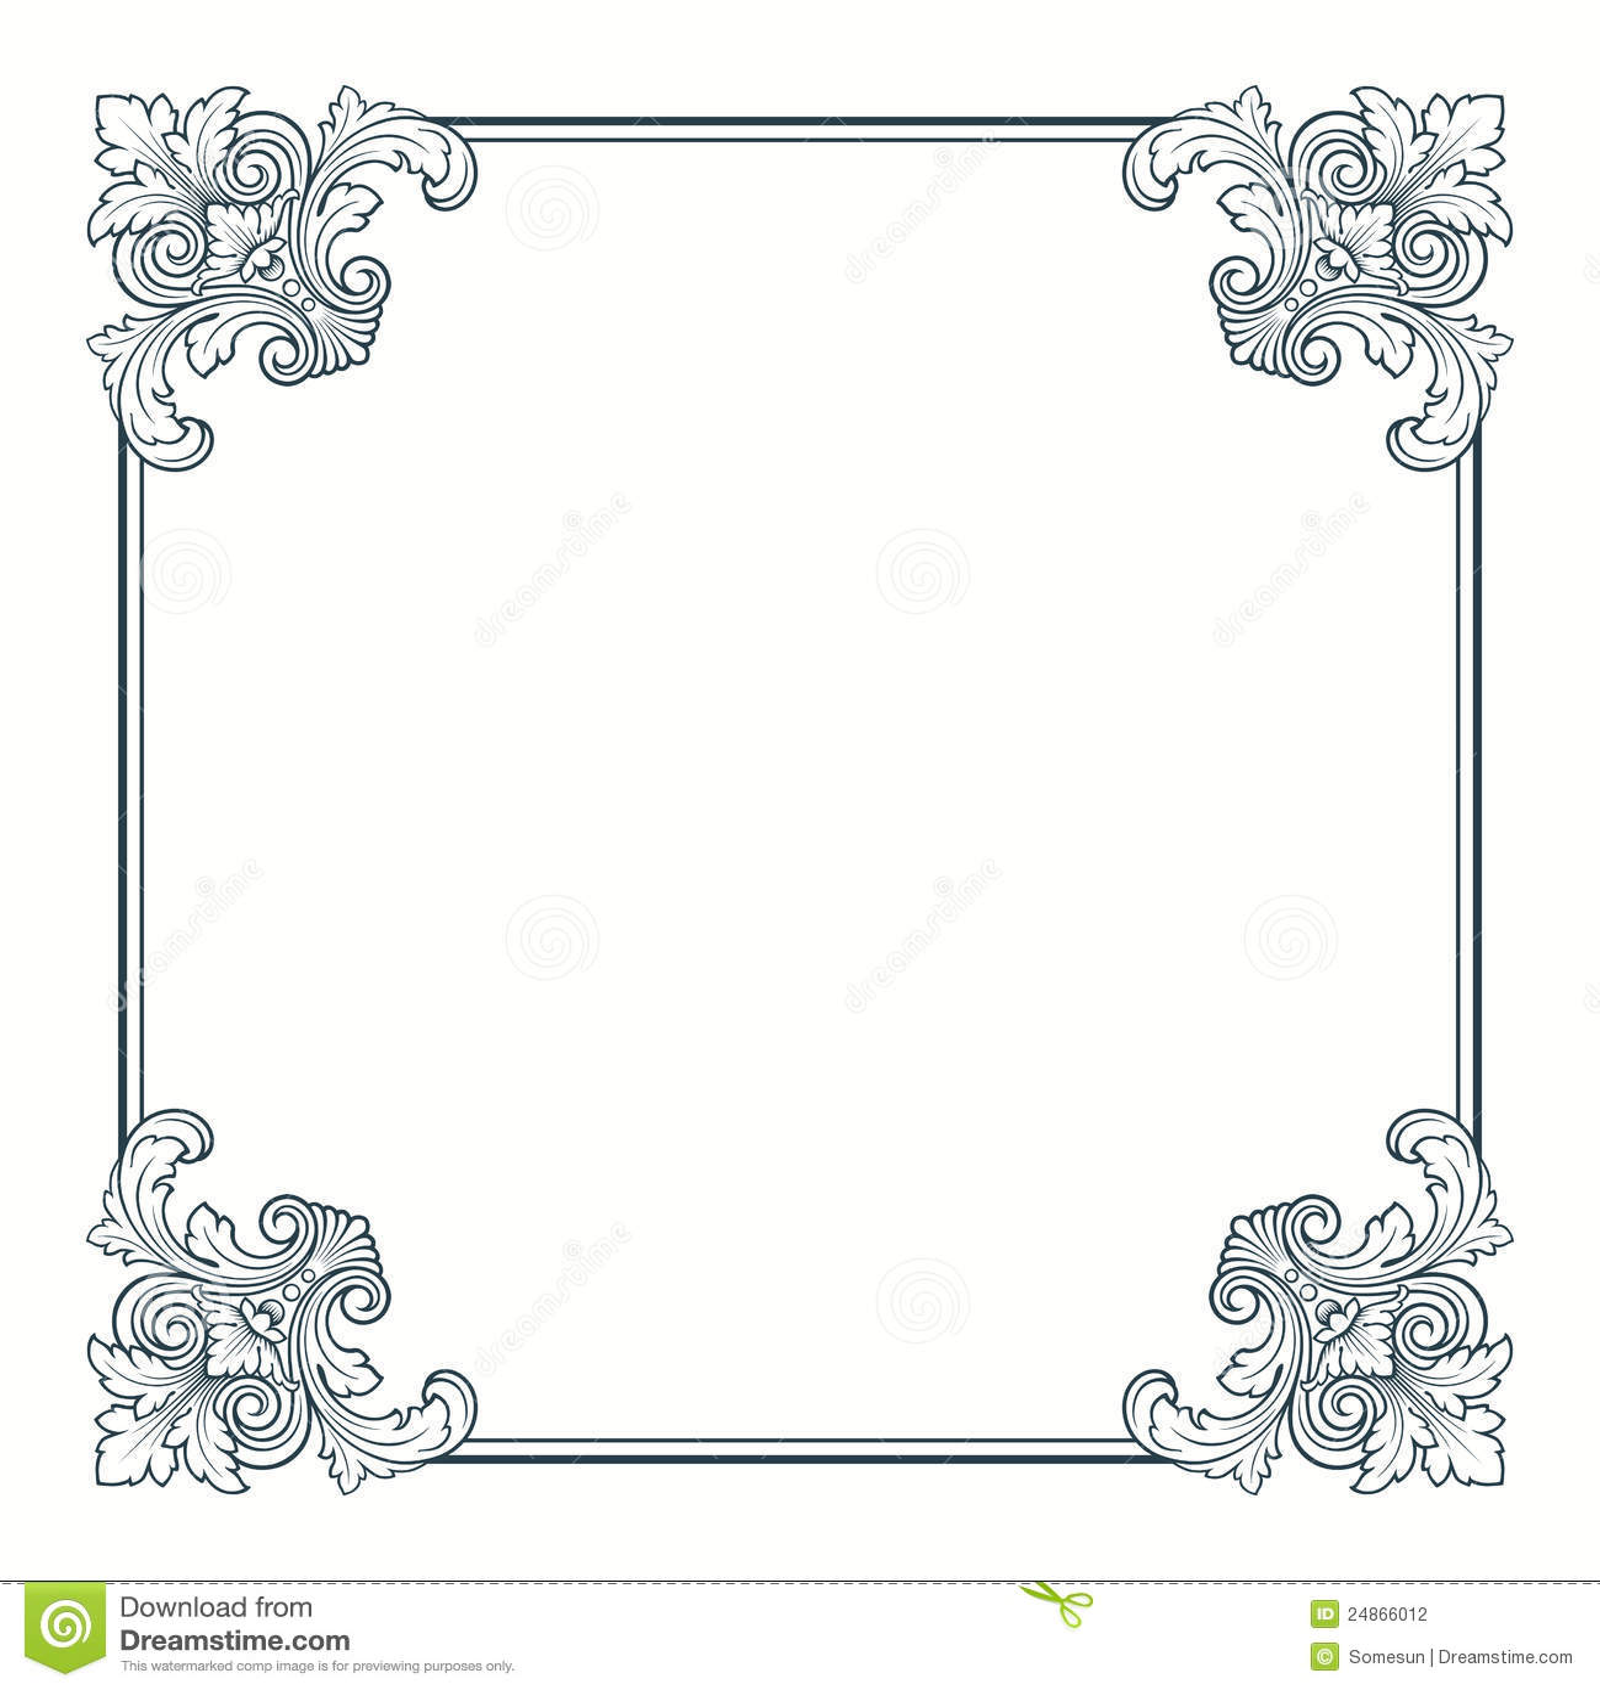 Vector Calligraphic Ornate Vintage Frame Border Stock Vector ...